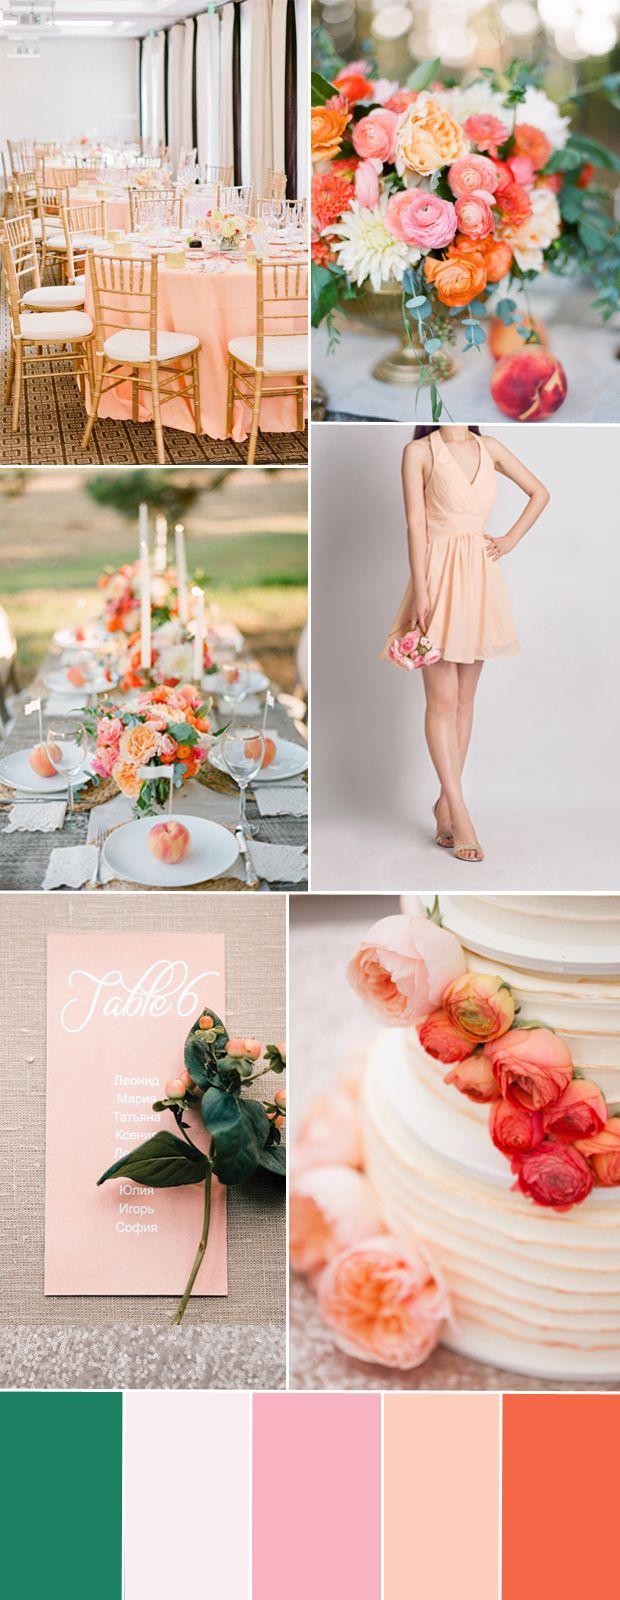 peach wedding color combos ideas and bridesmaid dress styles #weddingcolors